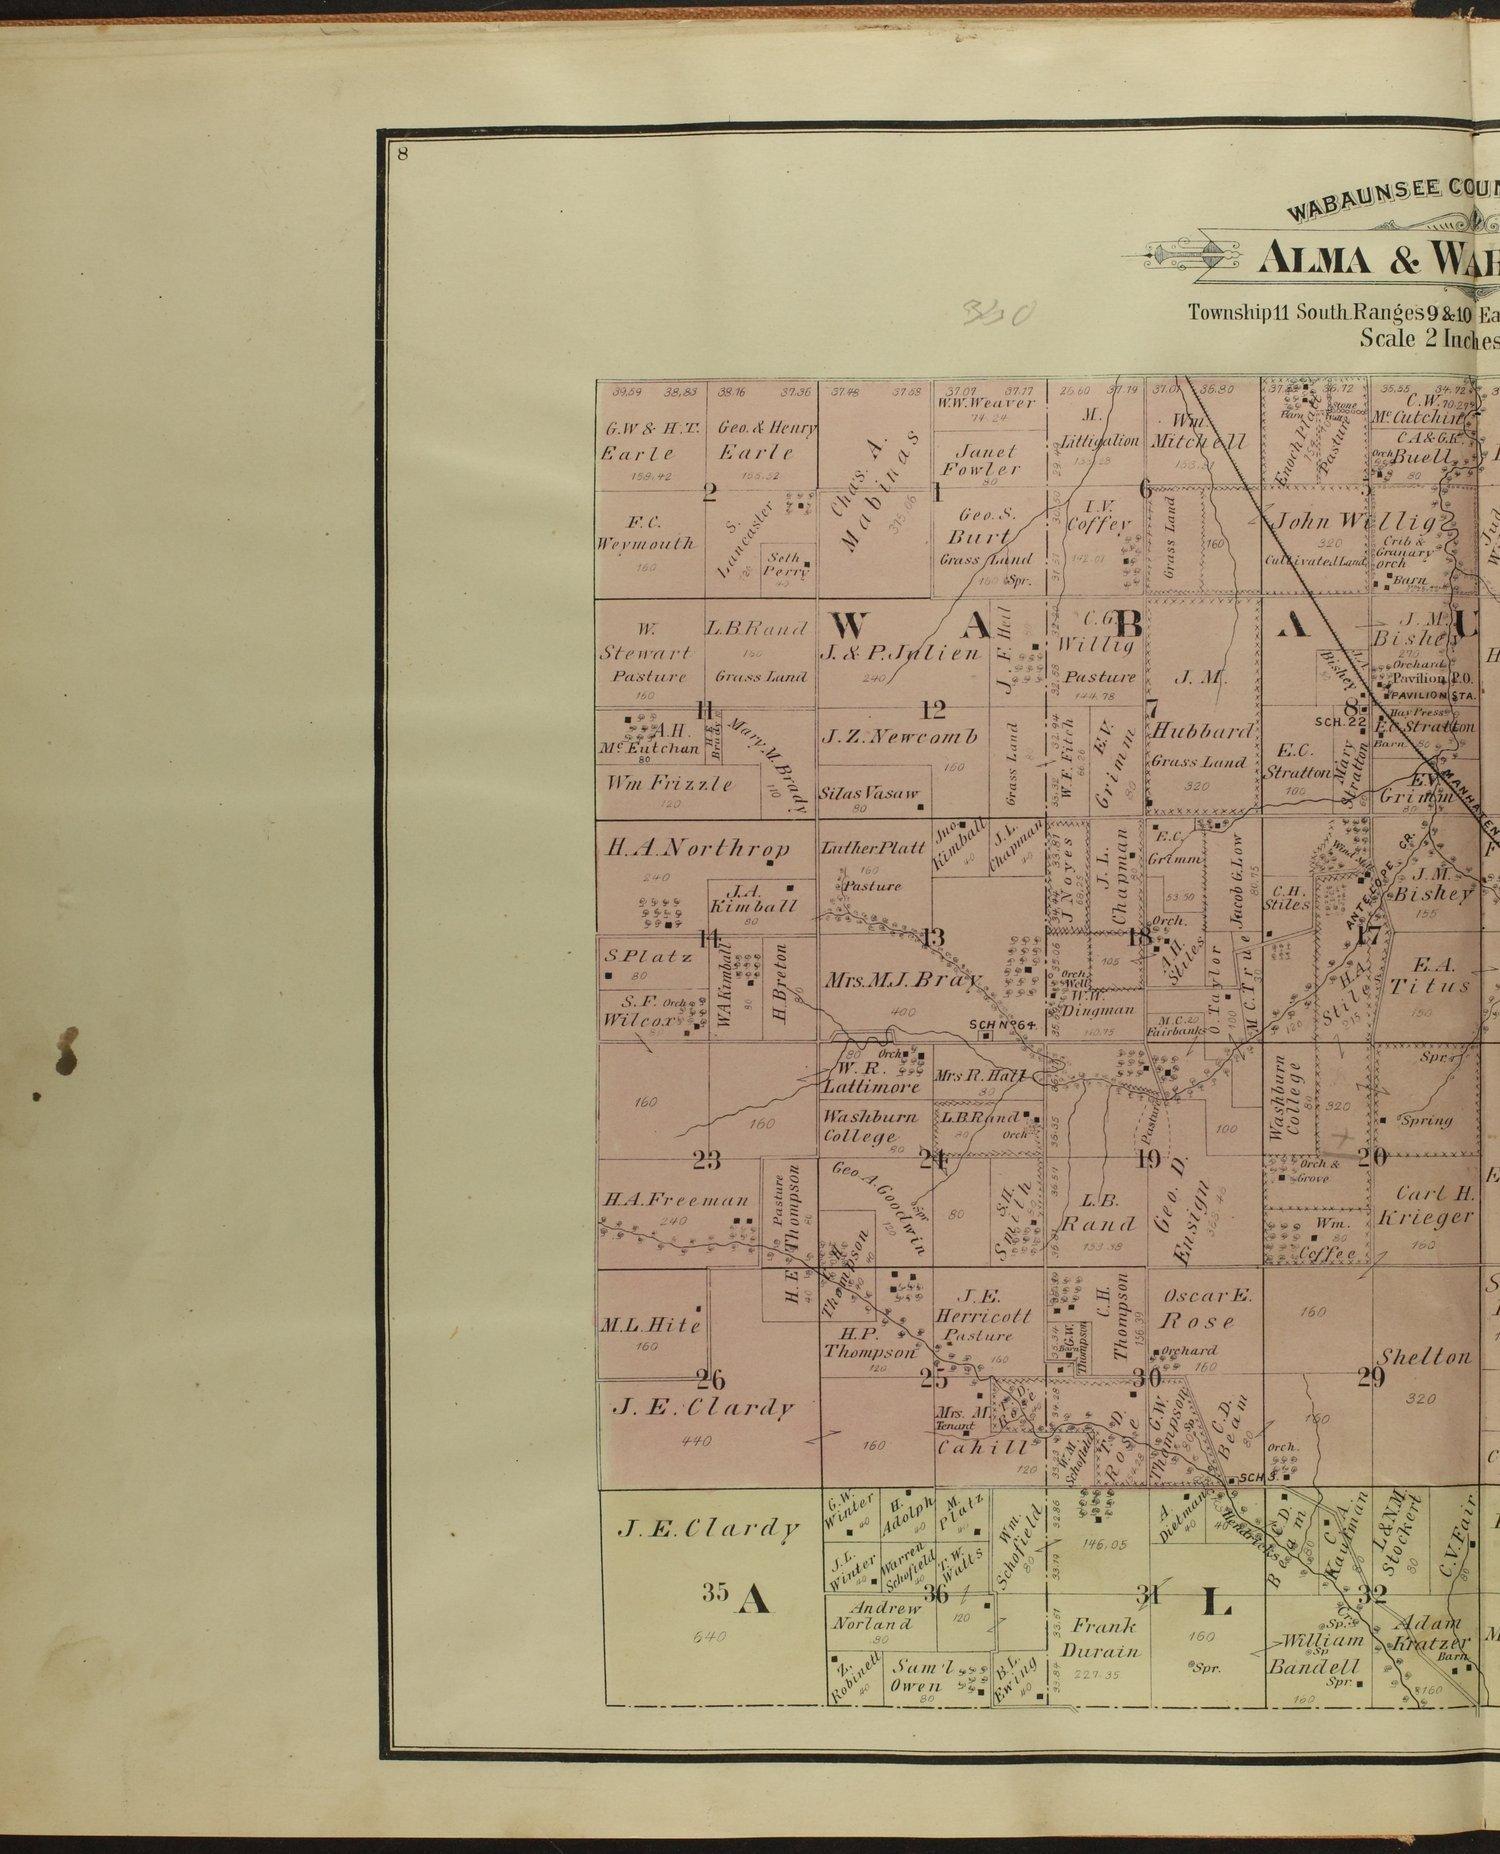 Atlas of Wabaunsee County, Kansas - 8